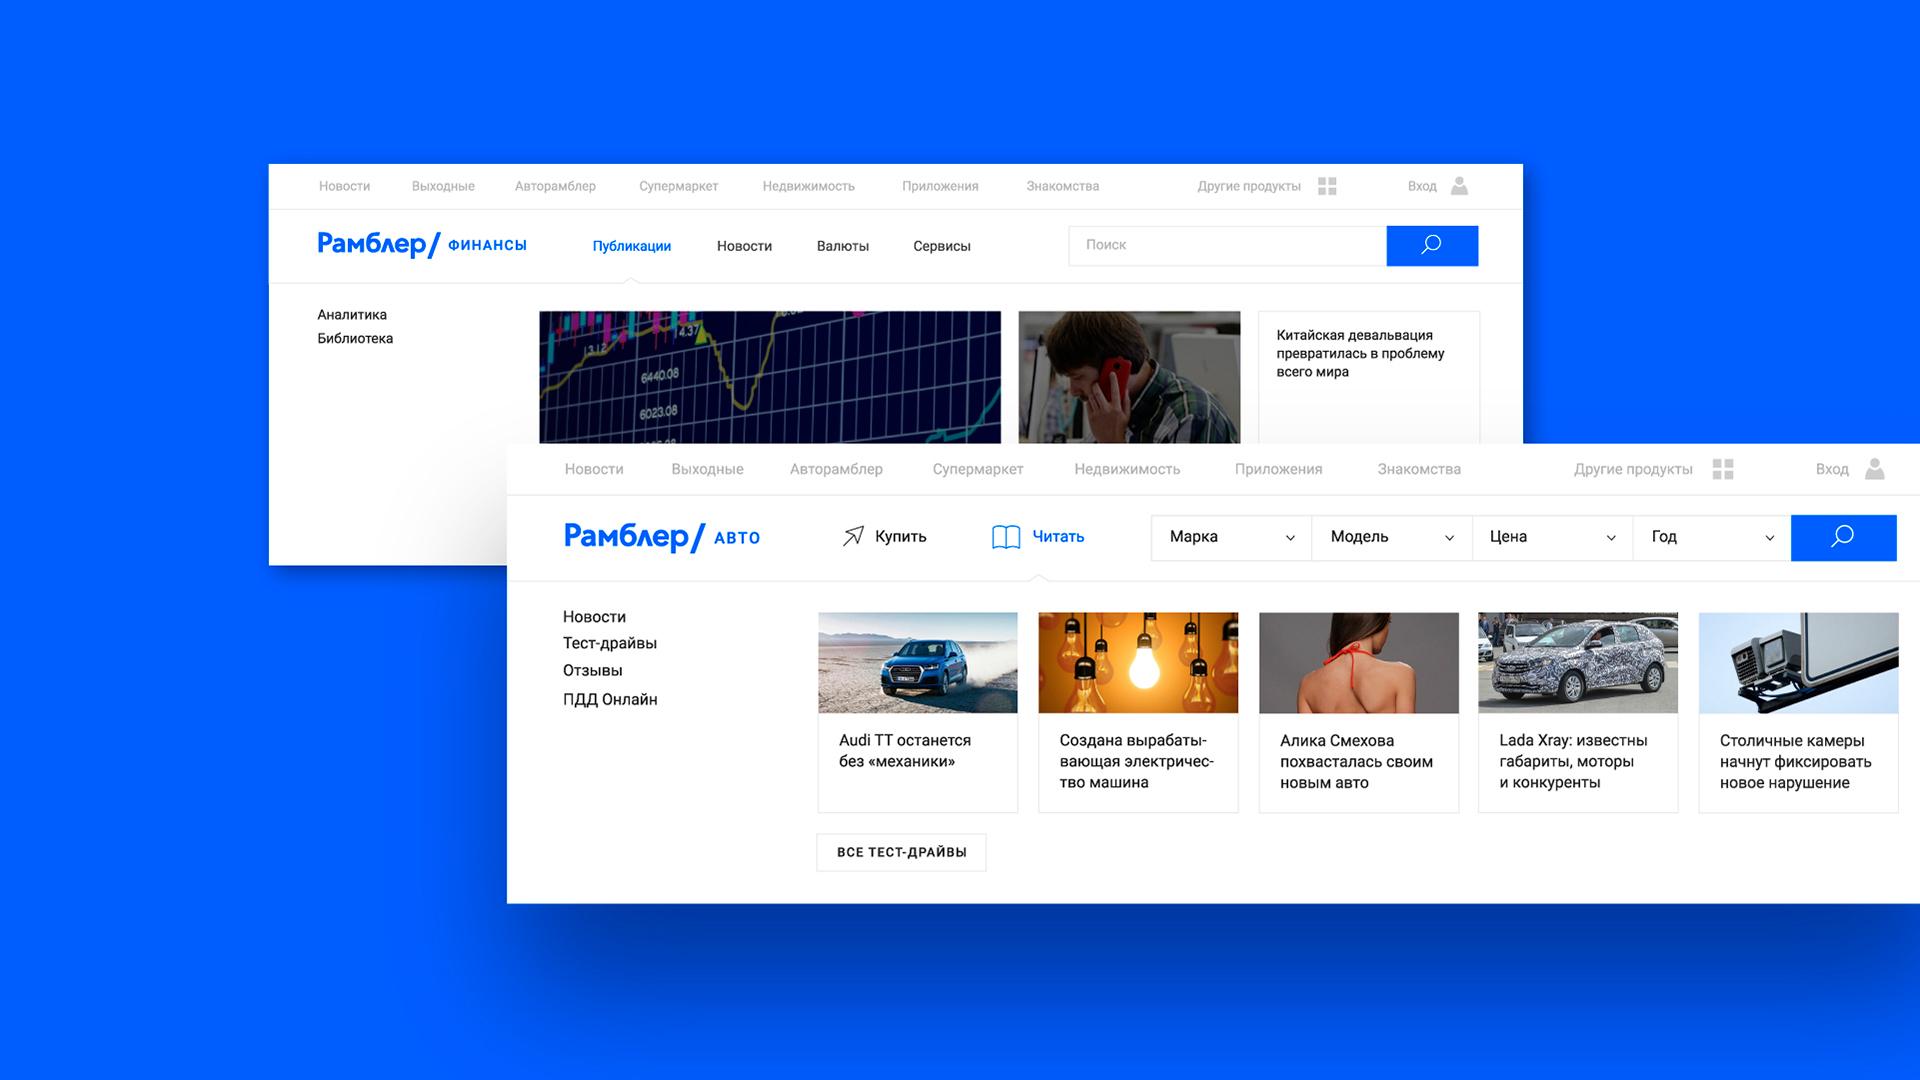 Rambler ru redesign and full UI kit on Behance